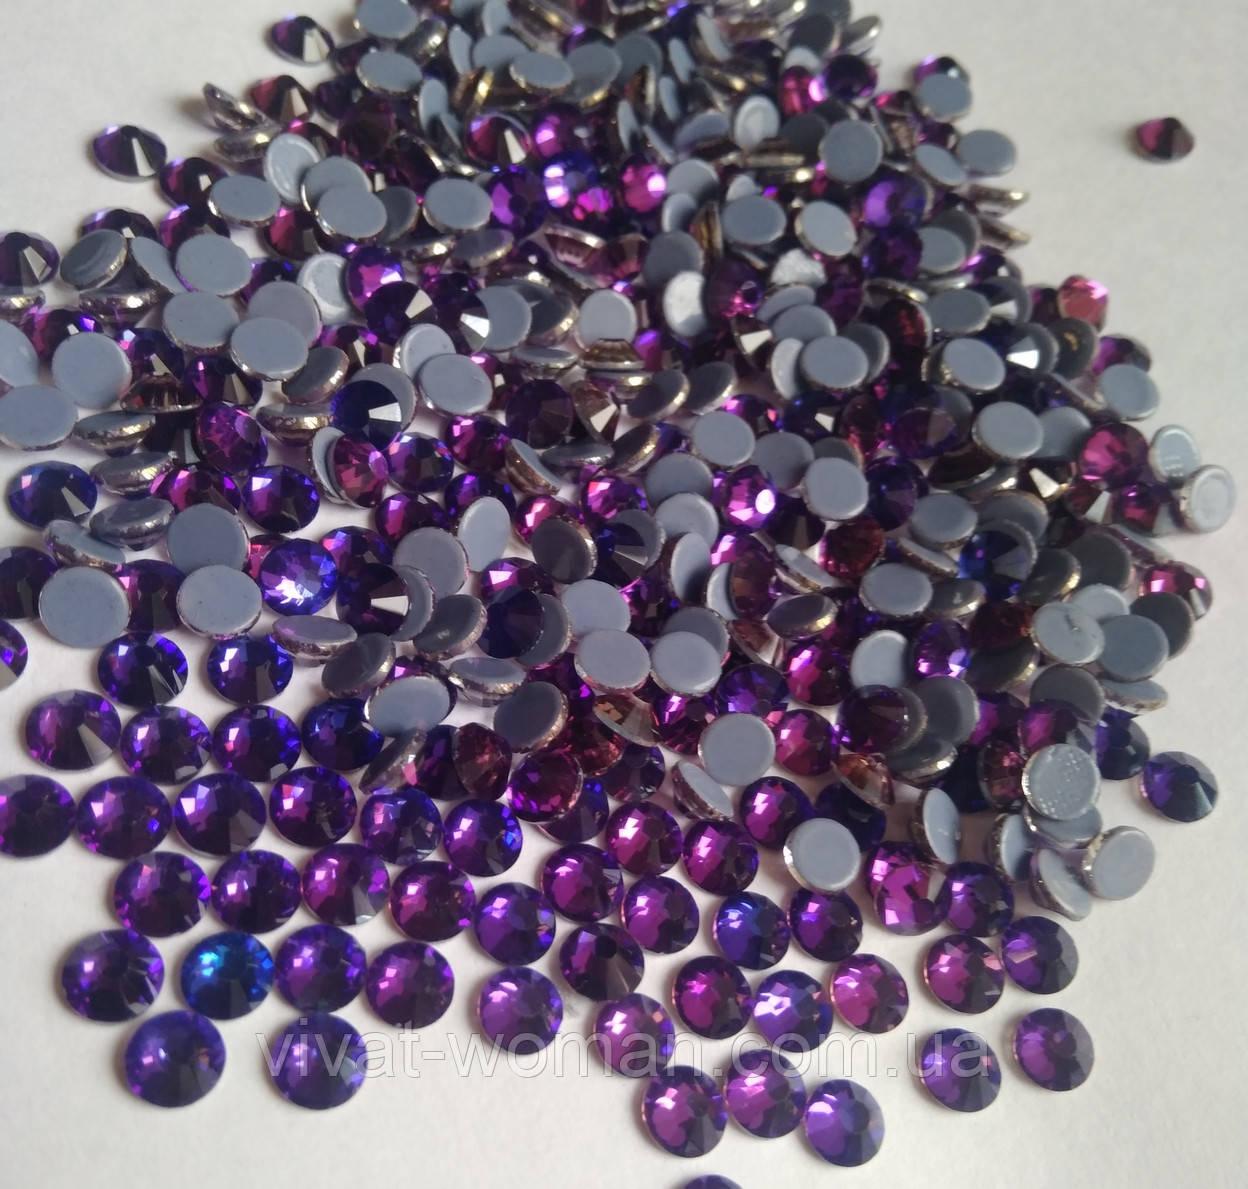 Стразы А+ Премиум, Purple Velvet SS20 (4,8-5,0 мм) термоклеевые. Цена за 144 шт.